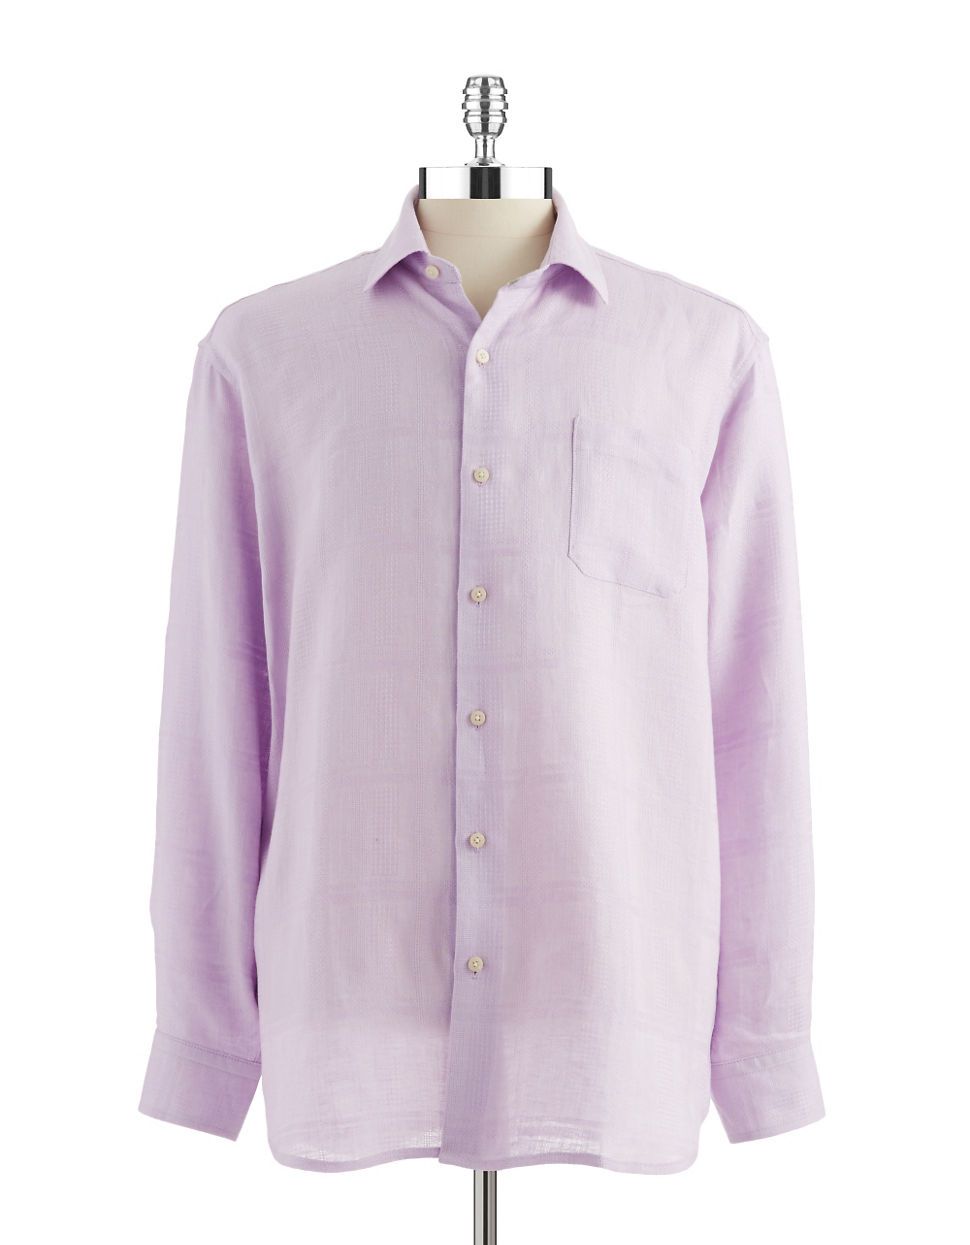 Tommy Bahama Monte Carlo Linen Buttondown Shirt In Purple